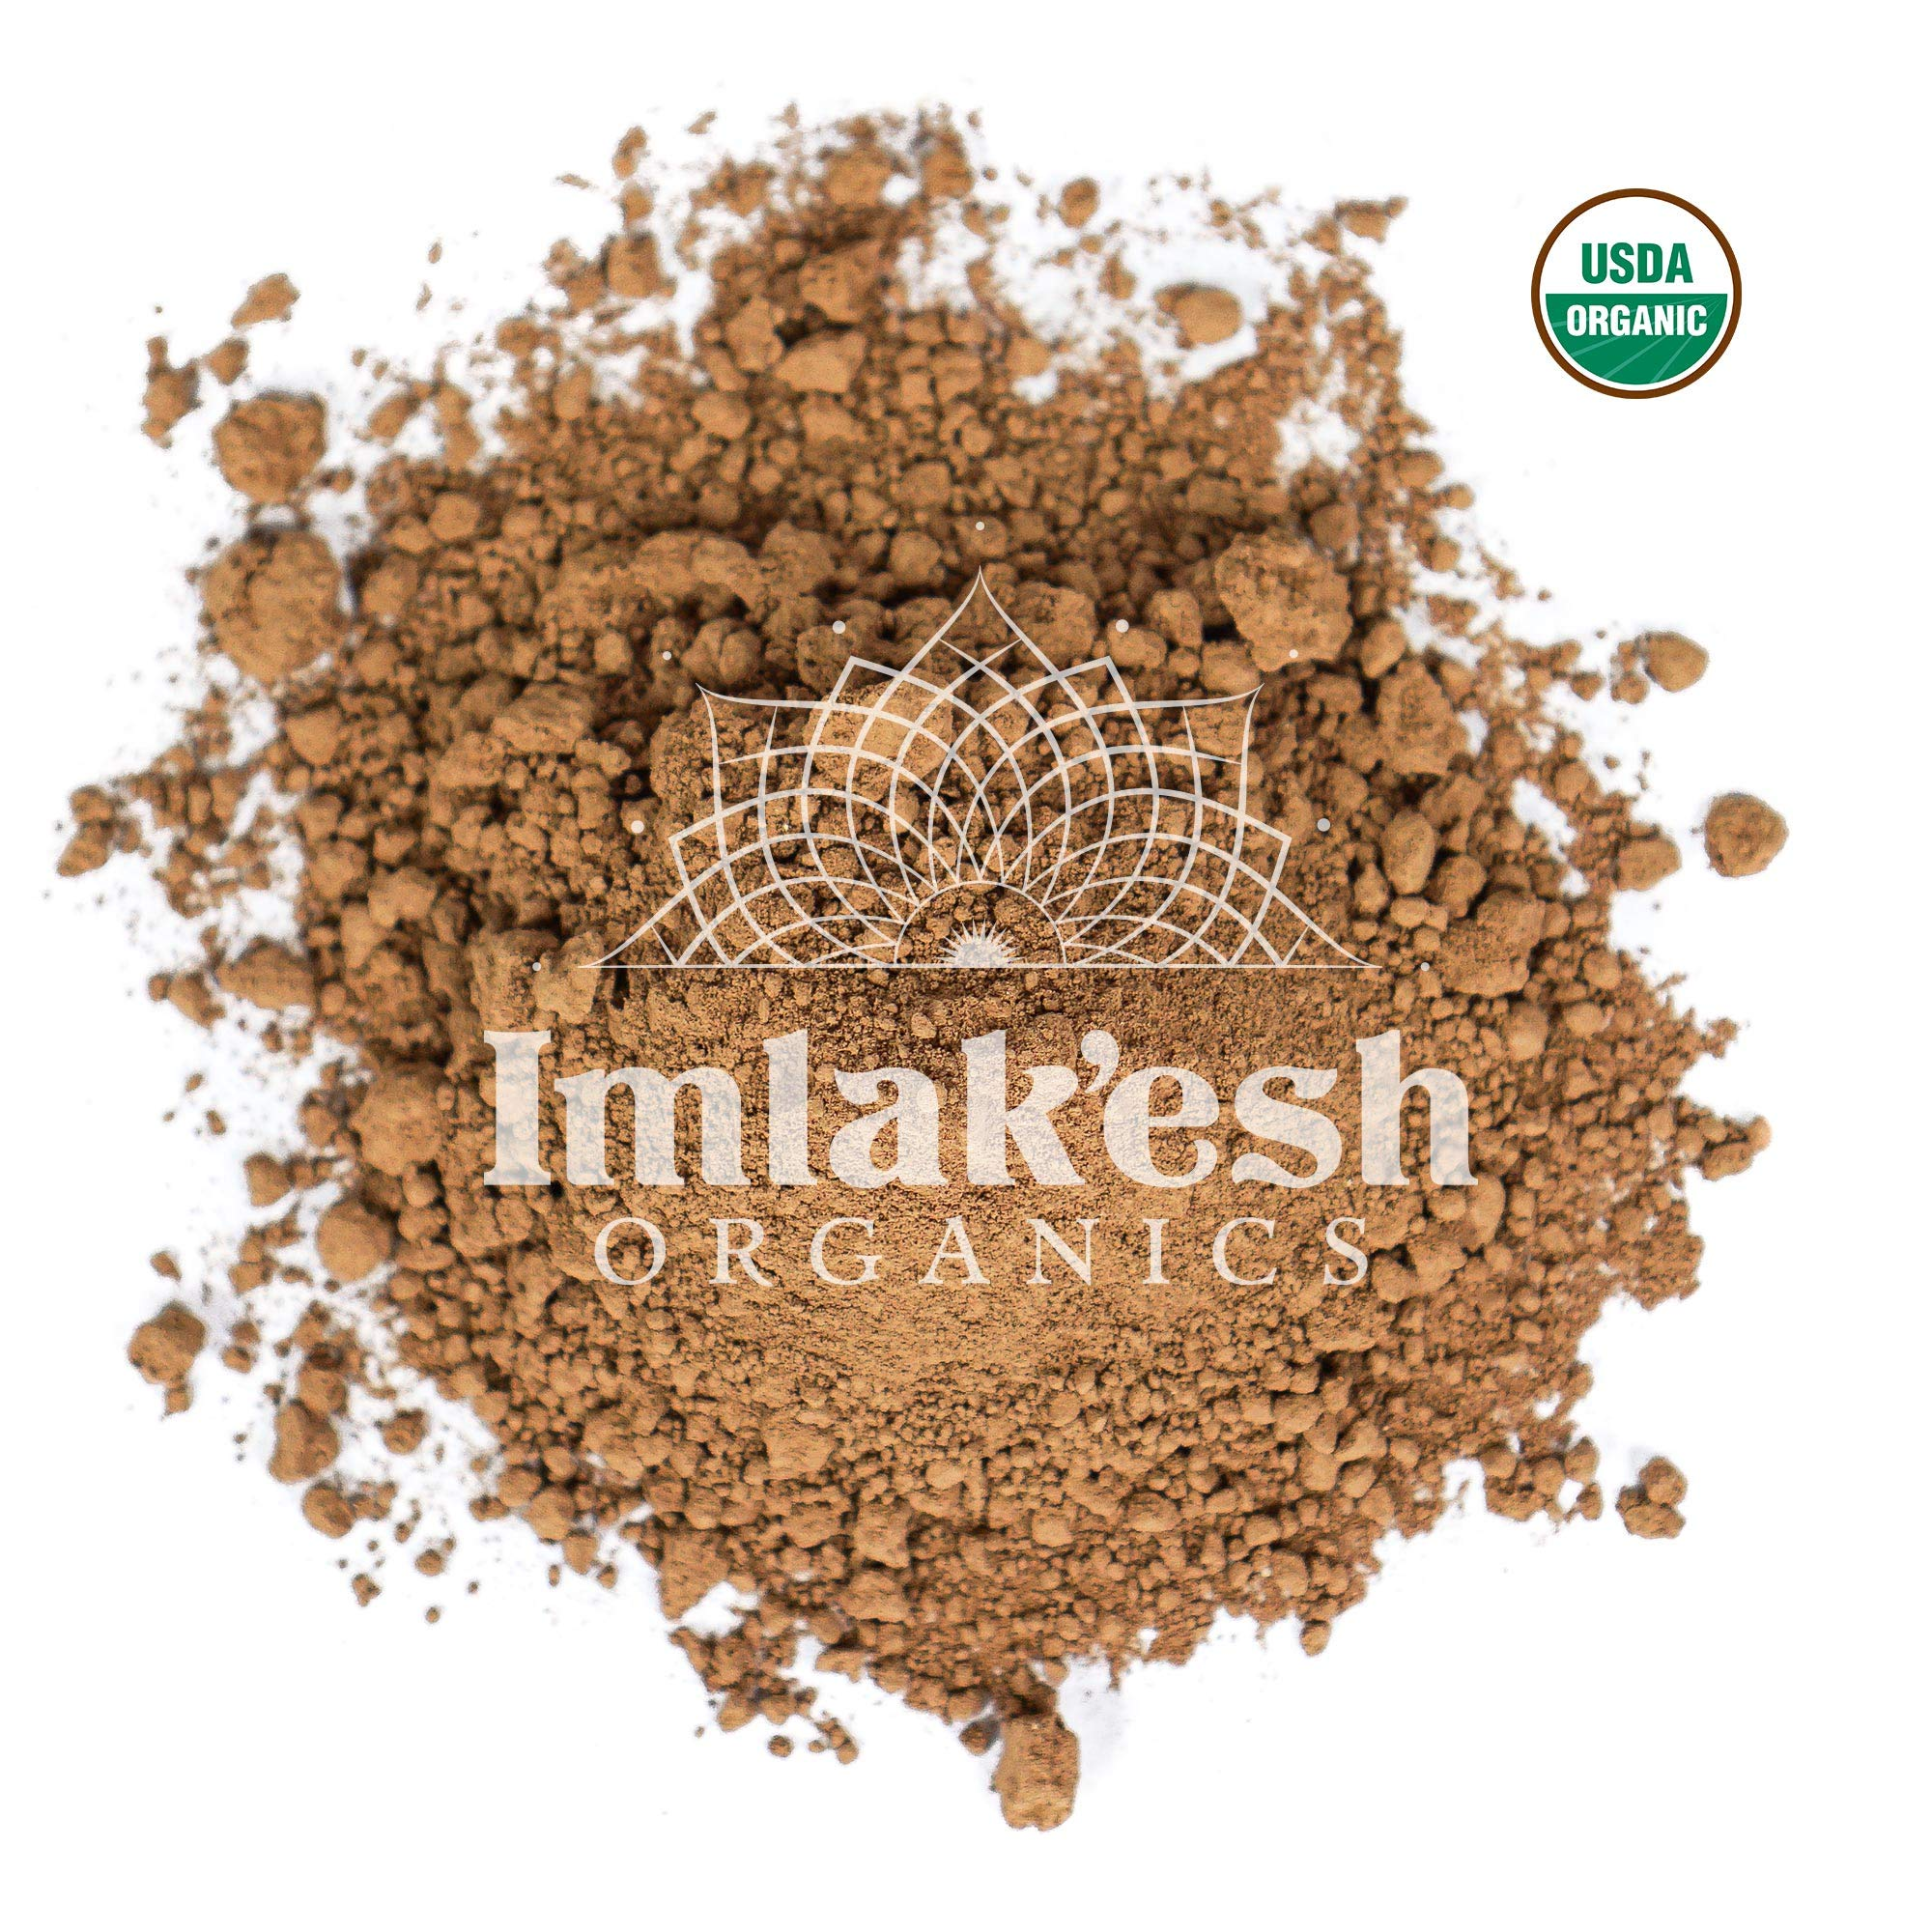 Imlak'esh Organics Cacao Powder, 55-Pound Bulk Bag